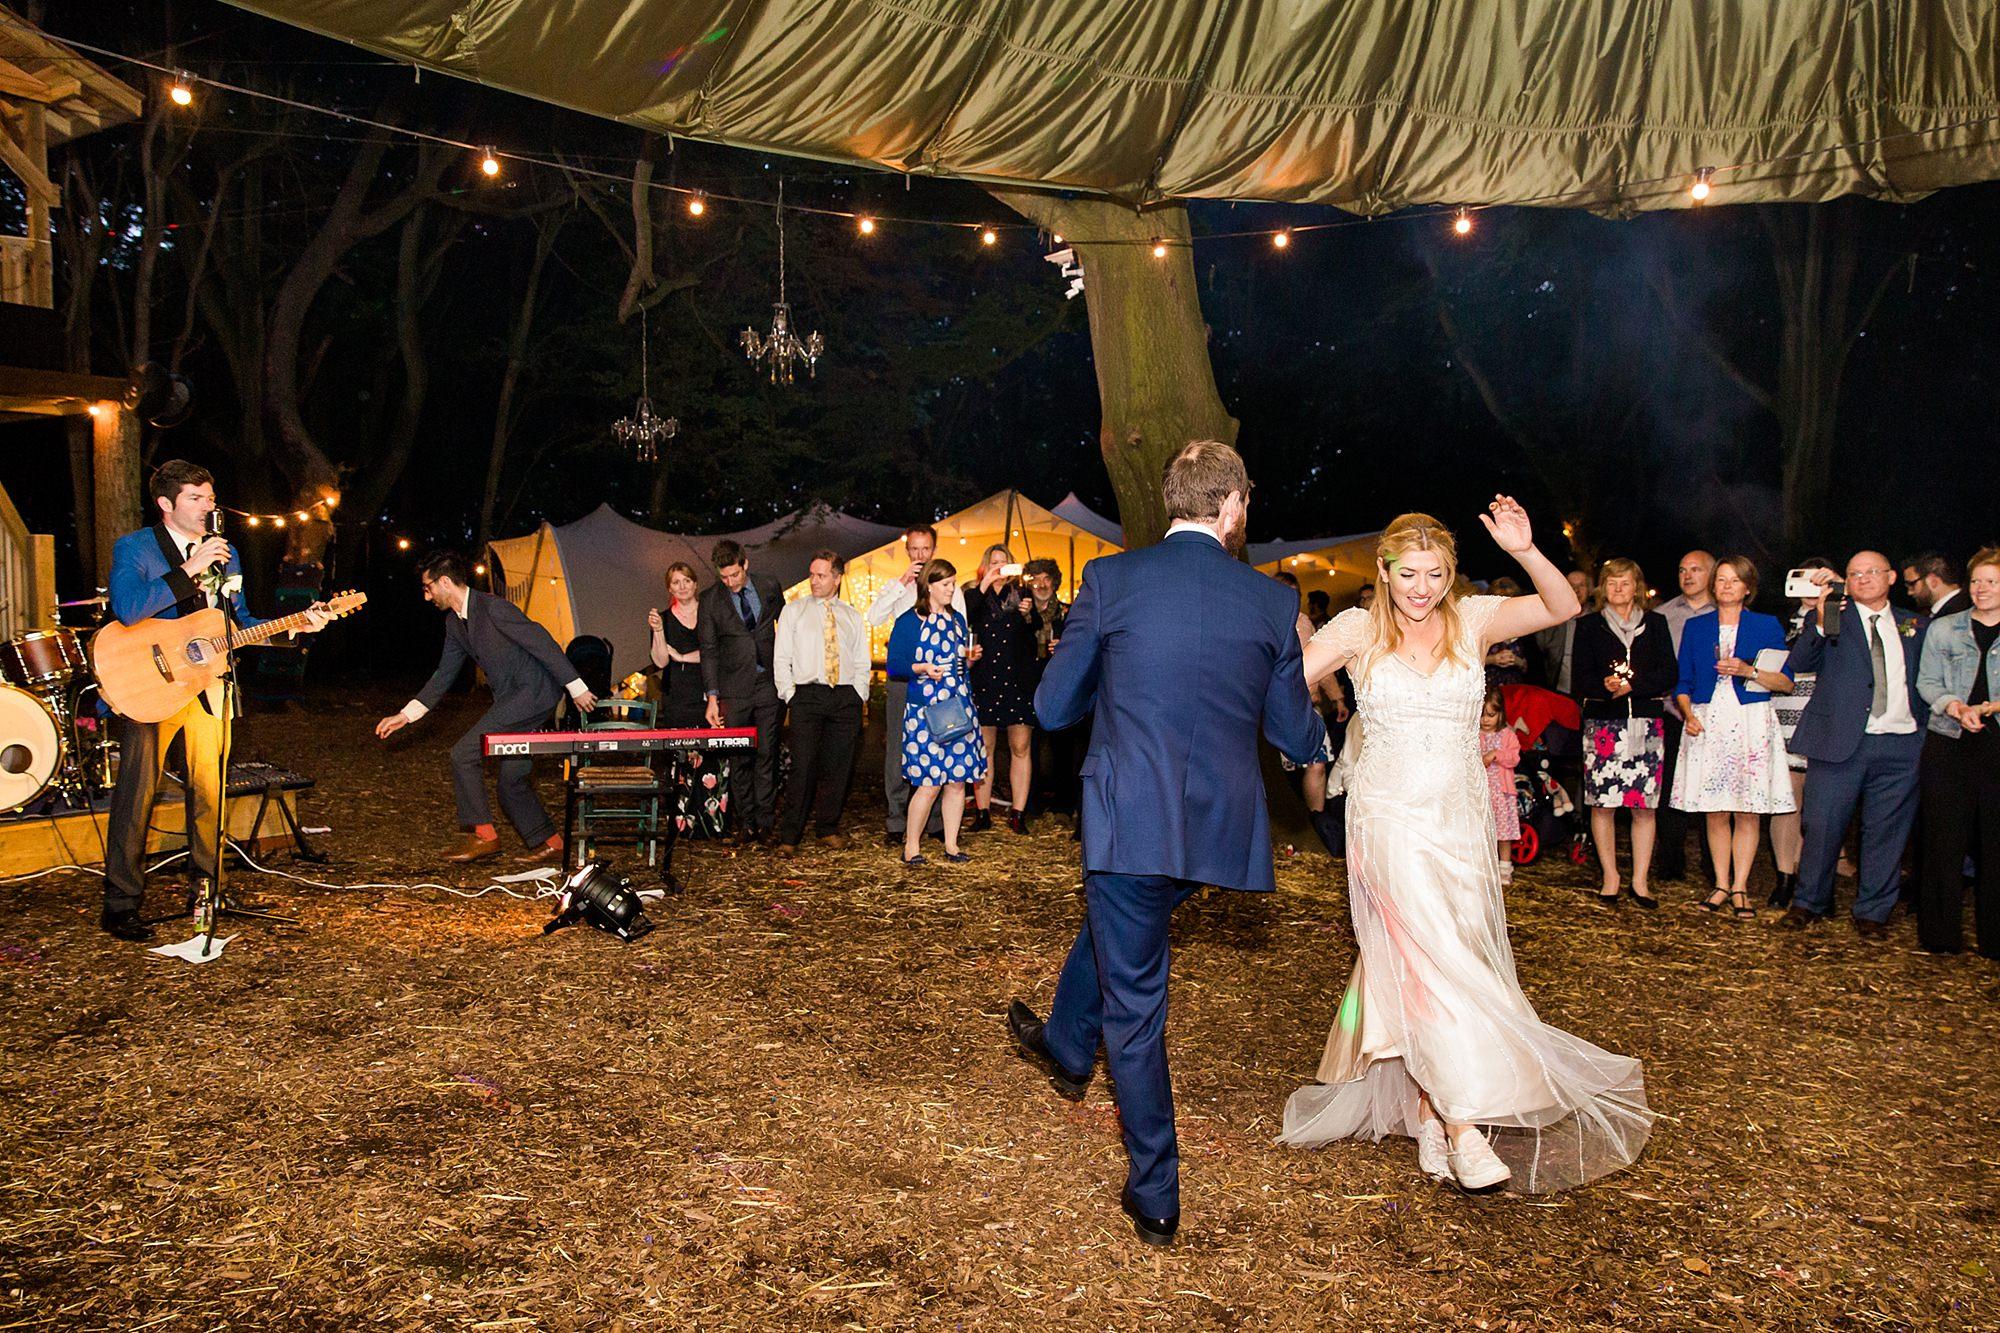 Woodland Weddings Tring bride and groom first dance swing dance